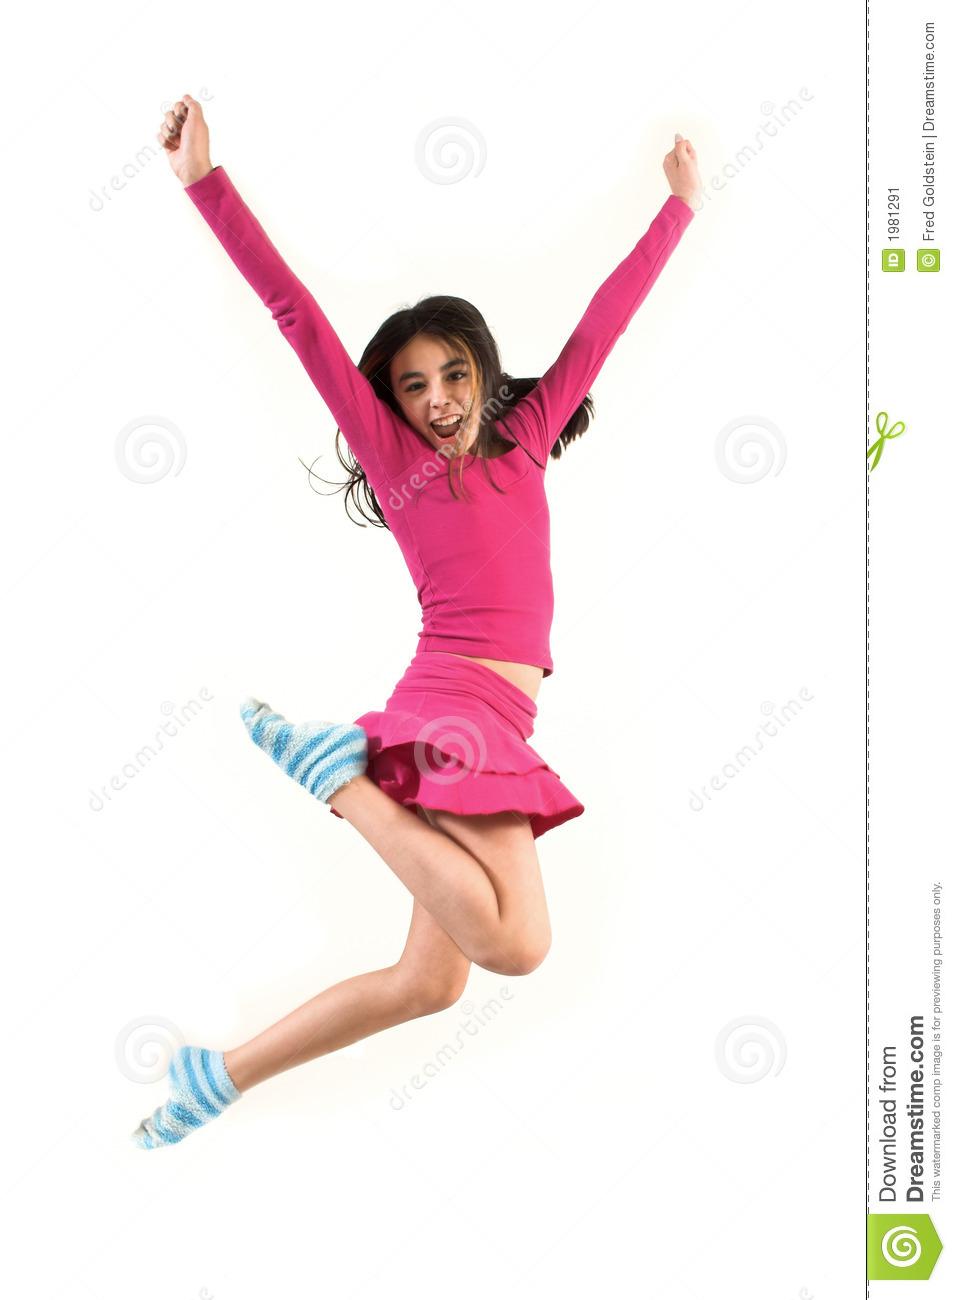 http://thumbs.dreamstime.com/z/teen-jumping-high-1981291.jpg